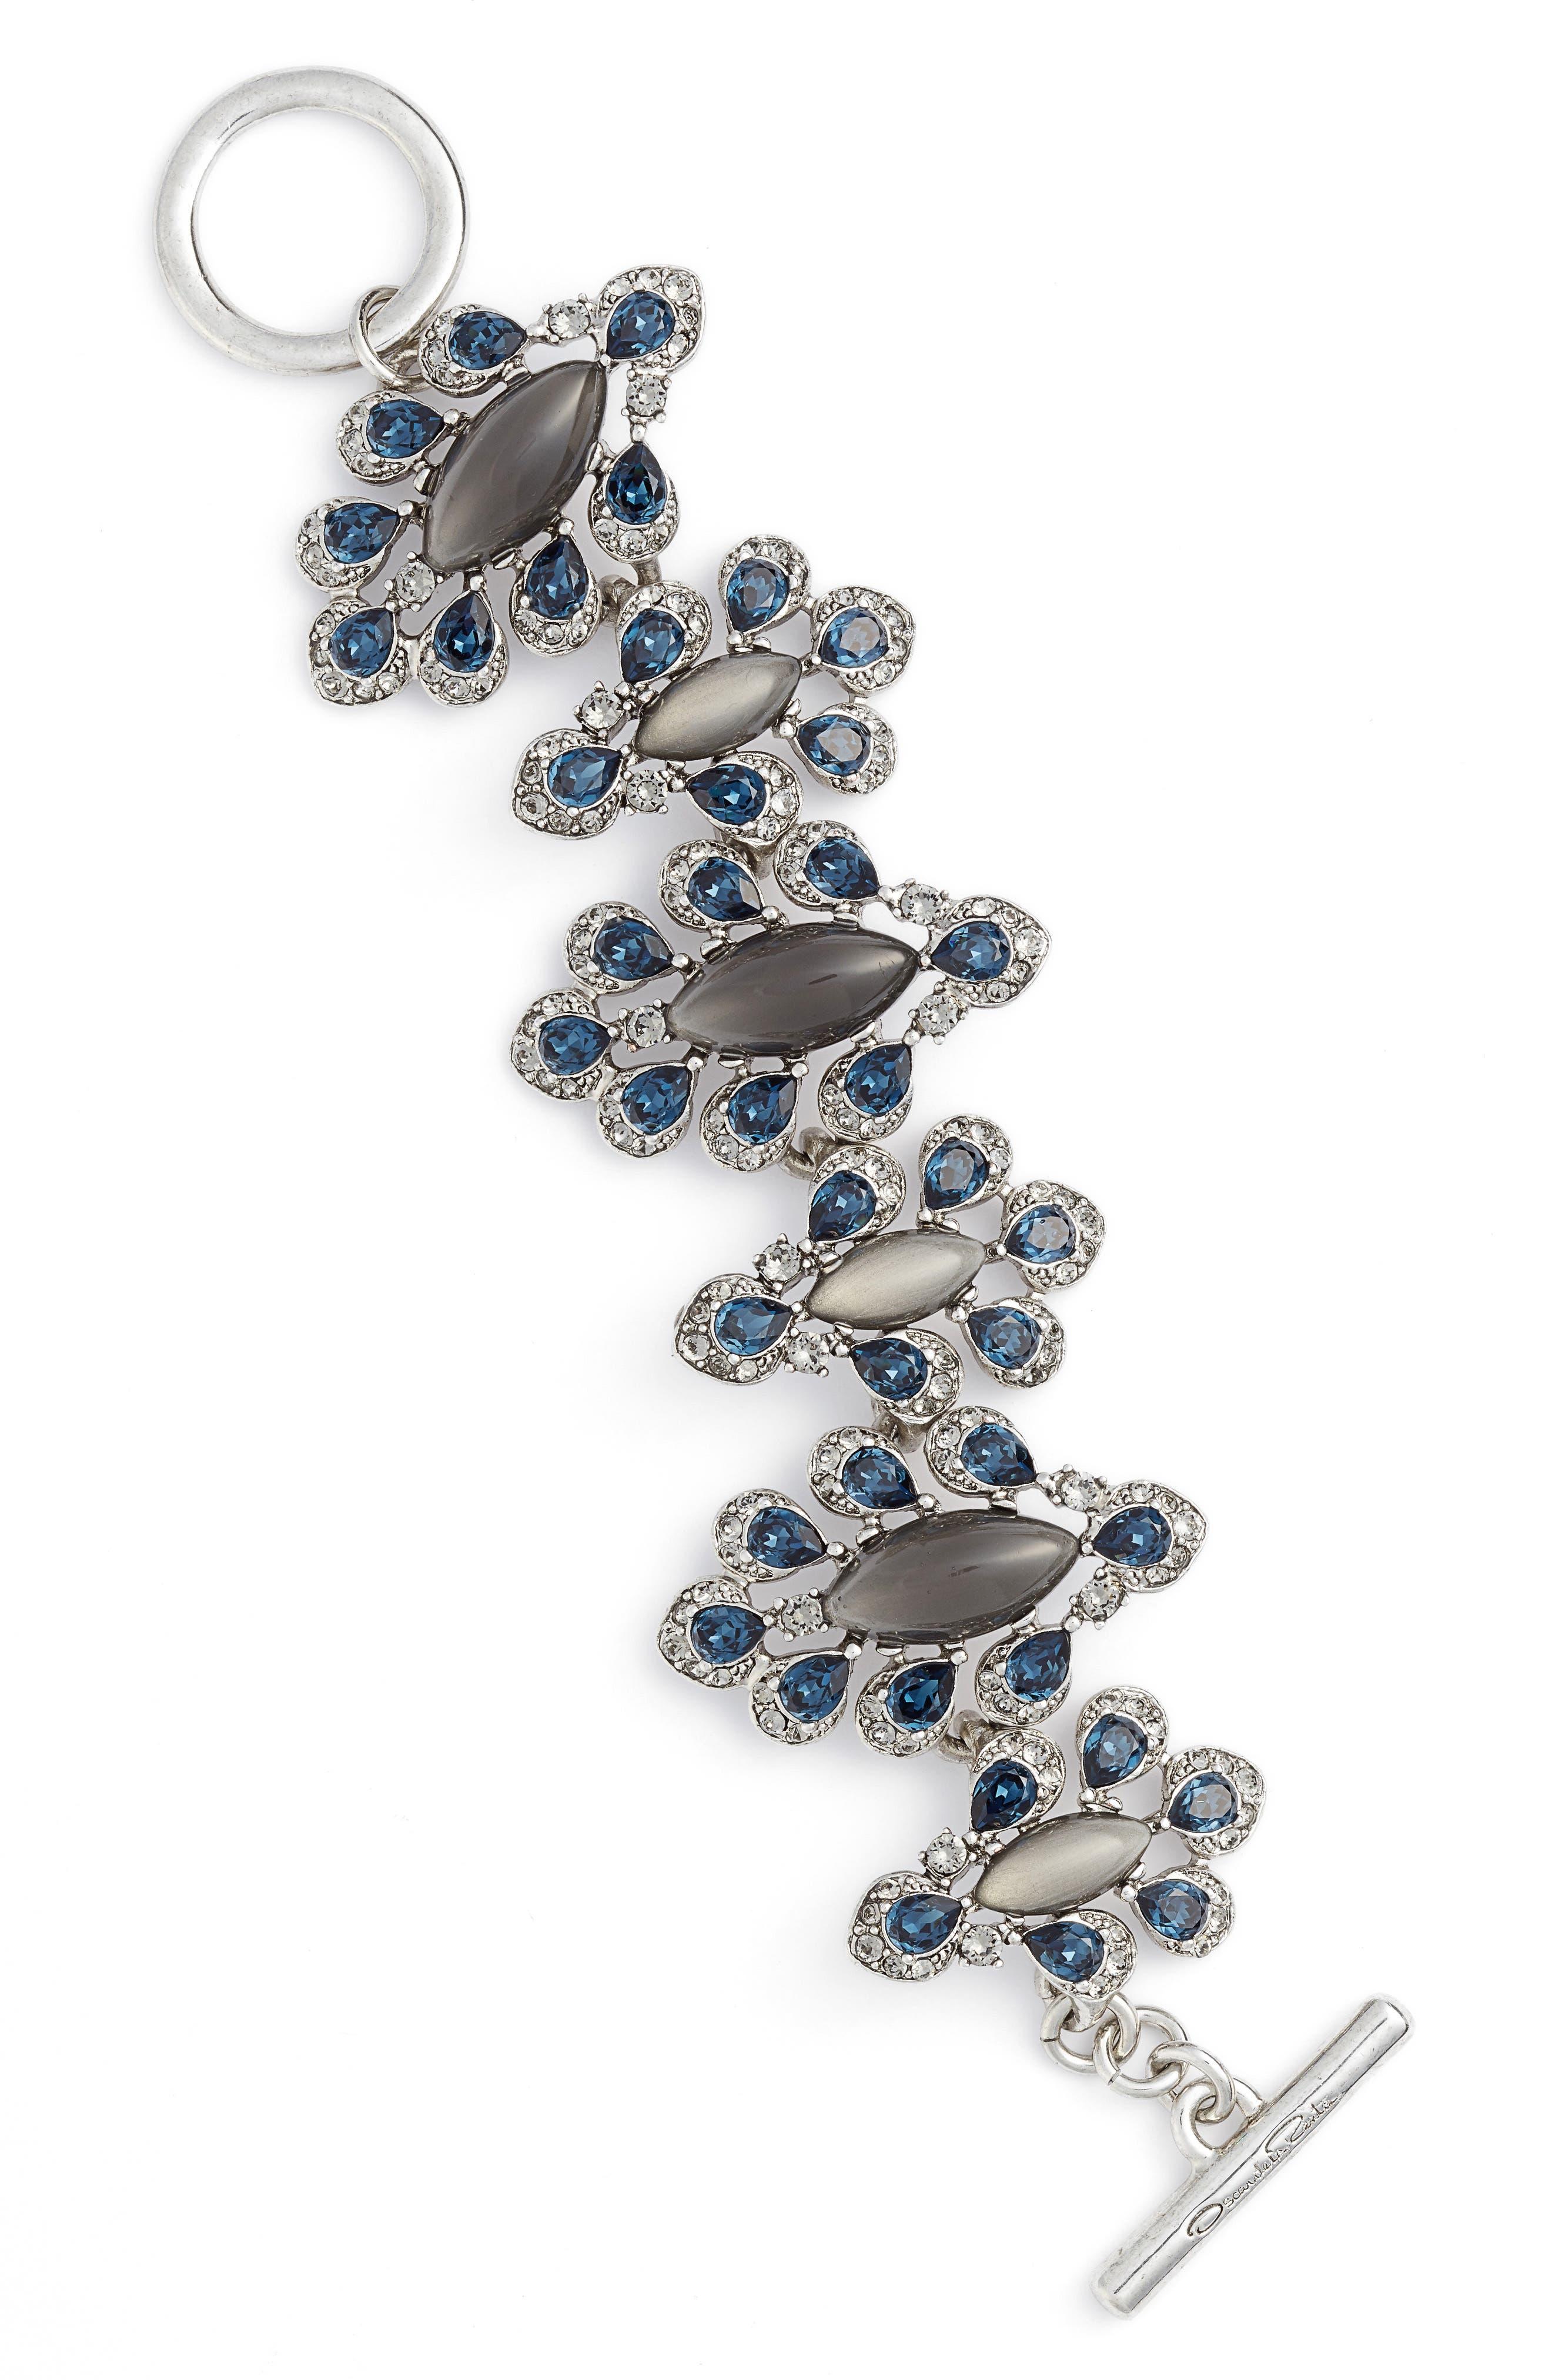 Main Image - Oscar de la Renta Parlor Swarovski Crystal Bracelet